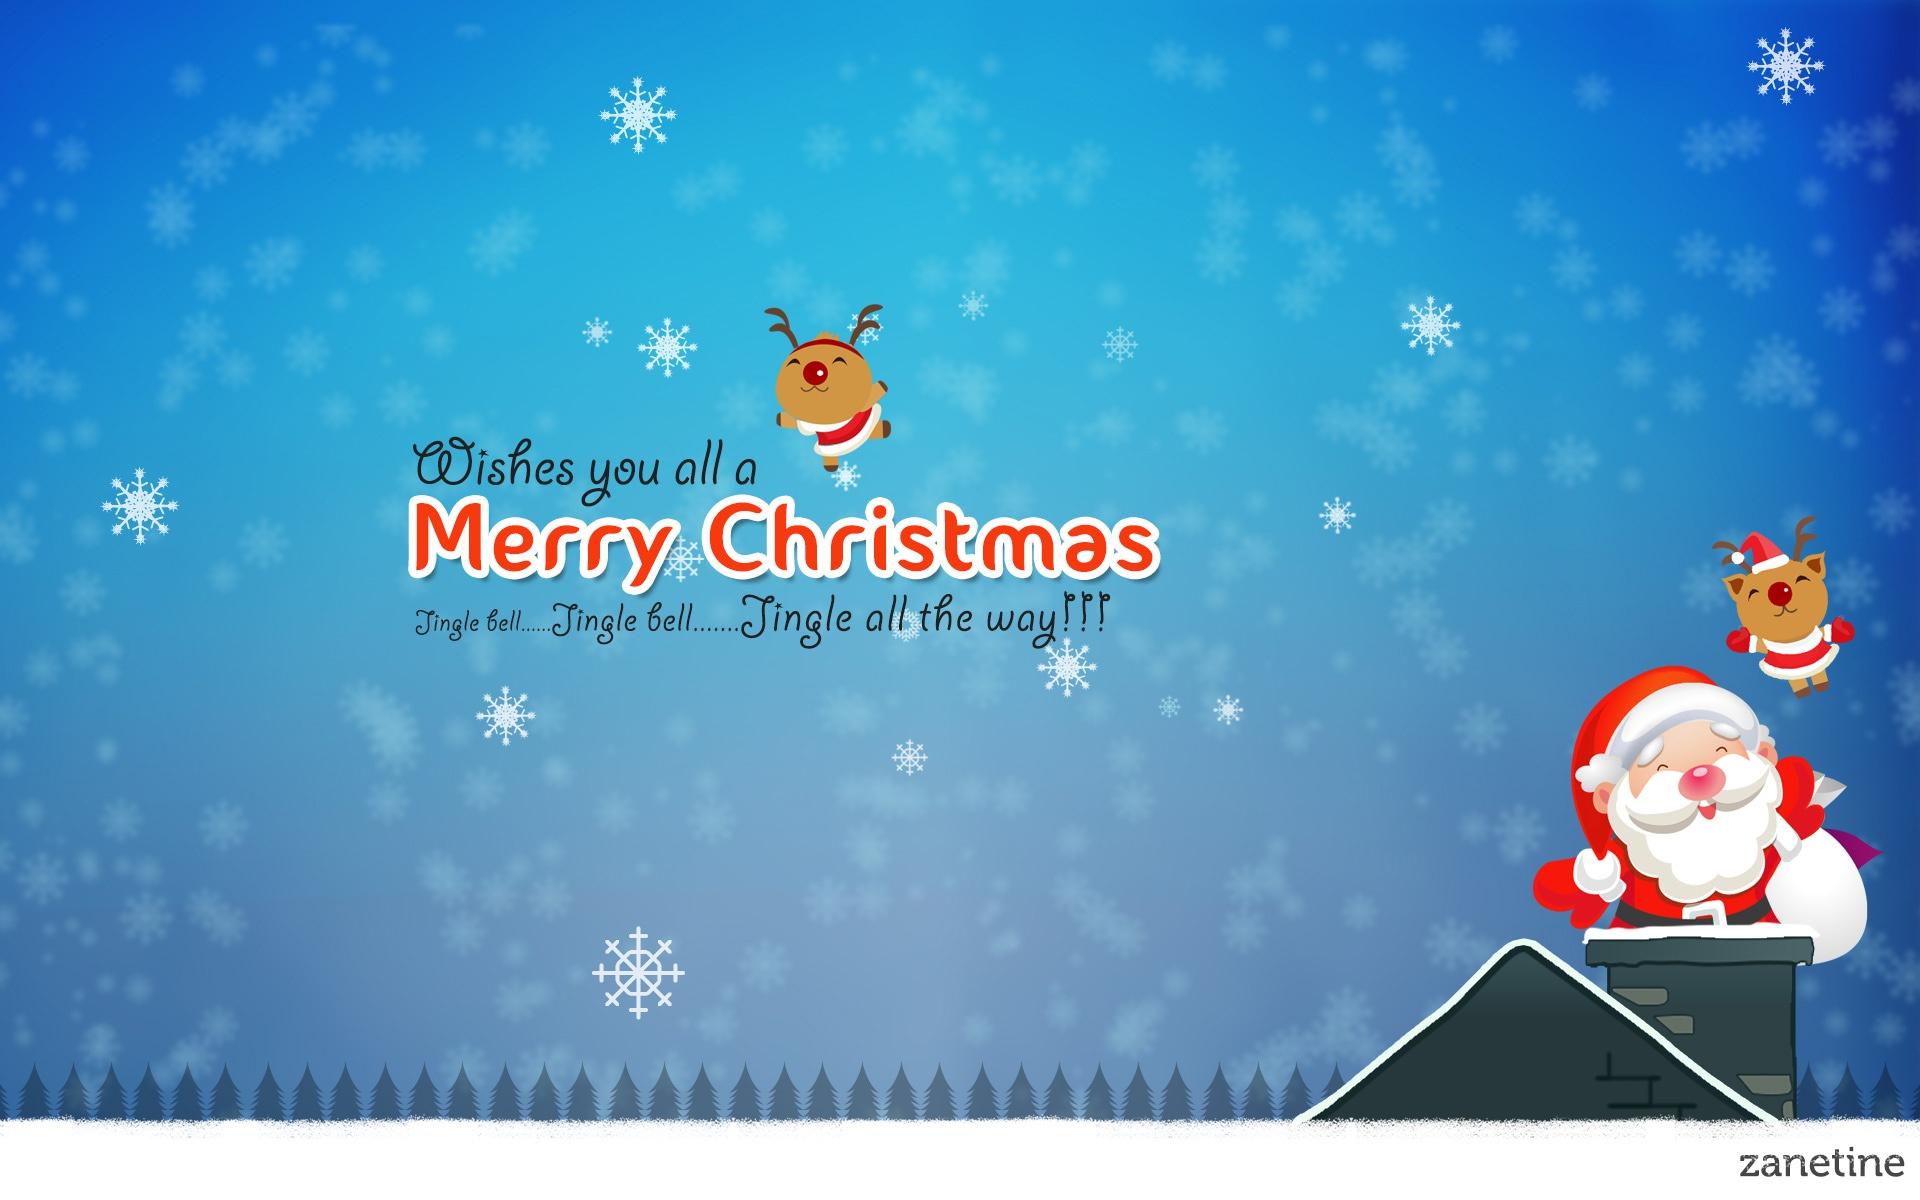 Merry Christmas Jingle Bells Wallpapers